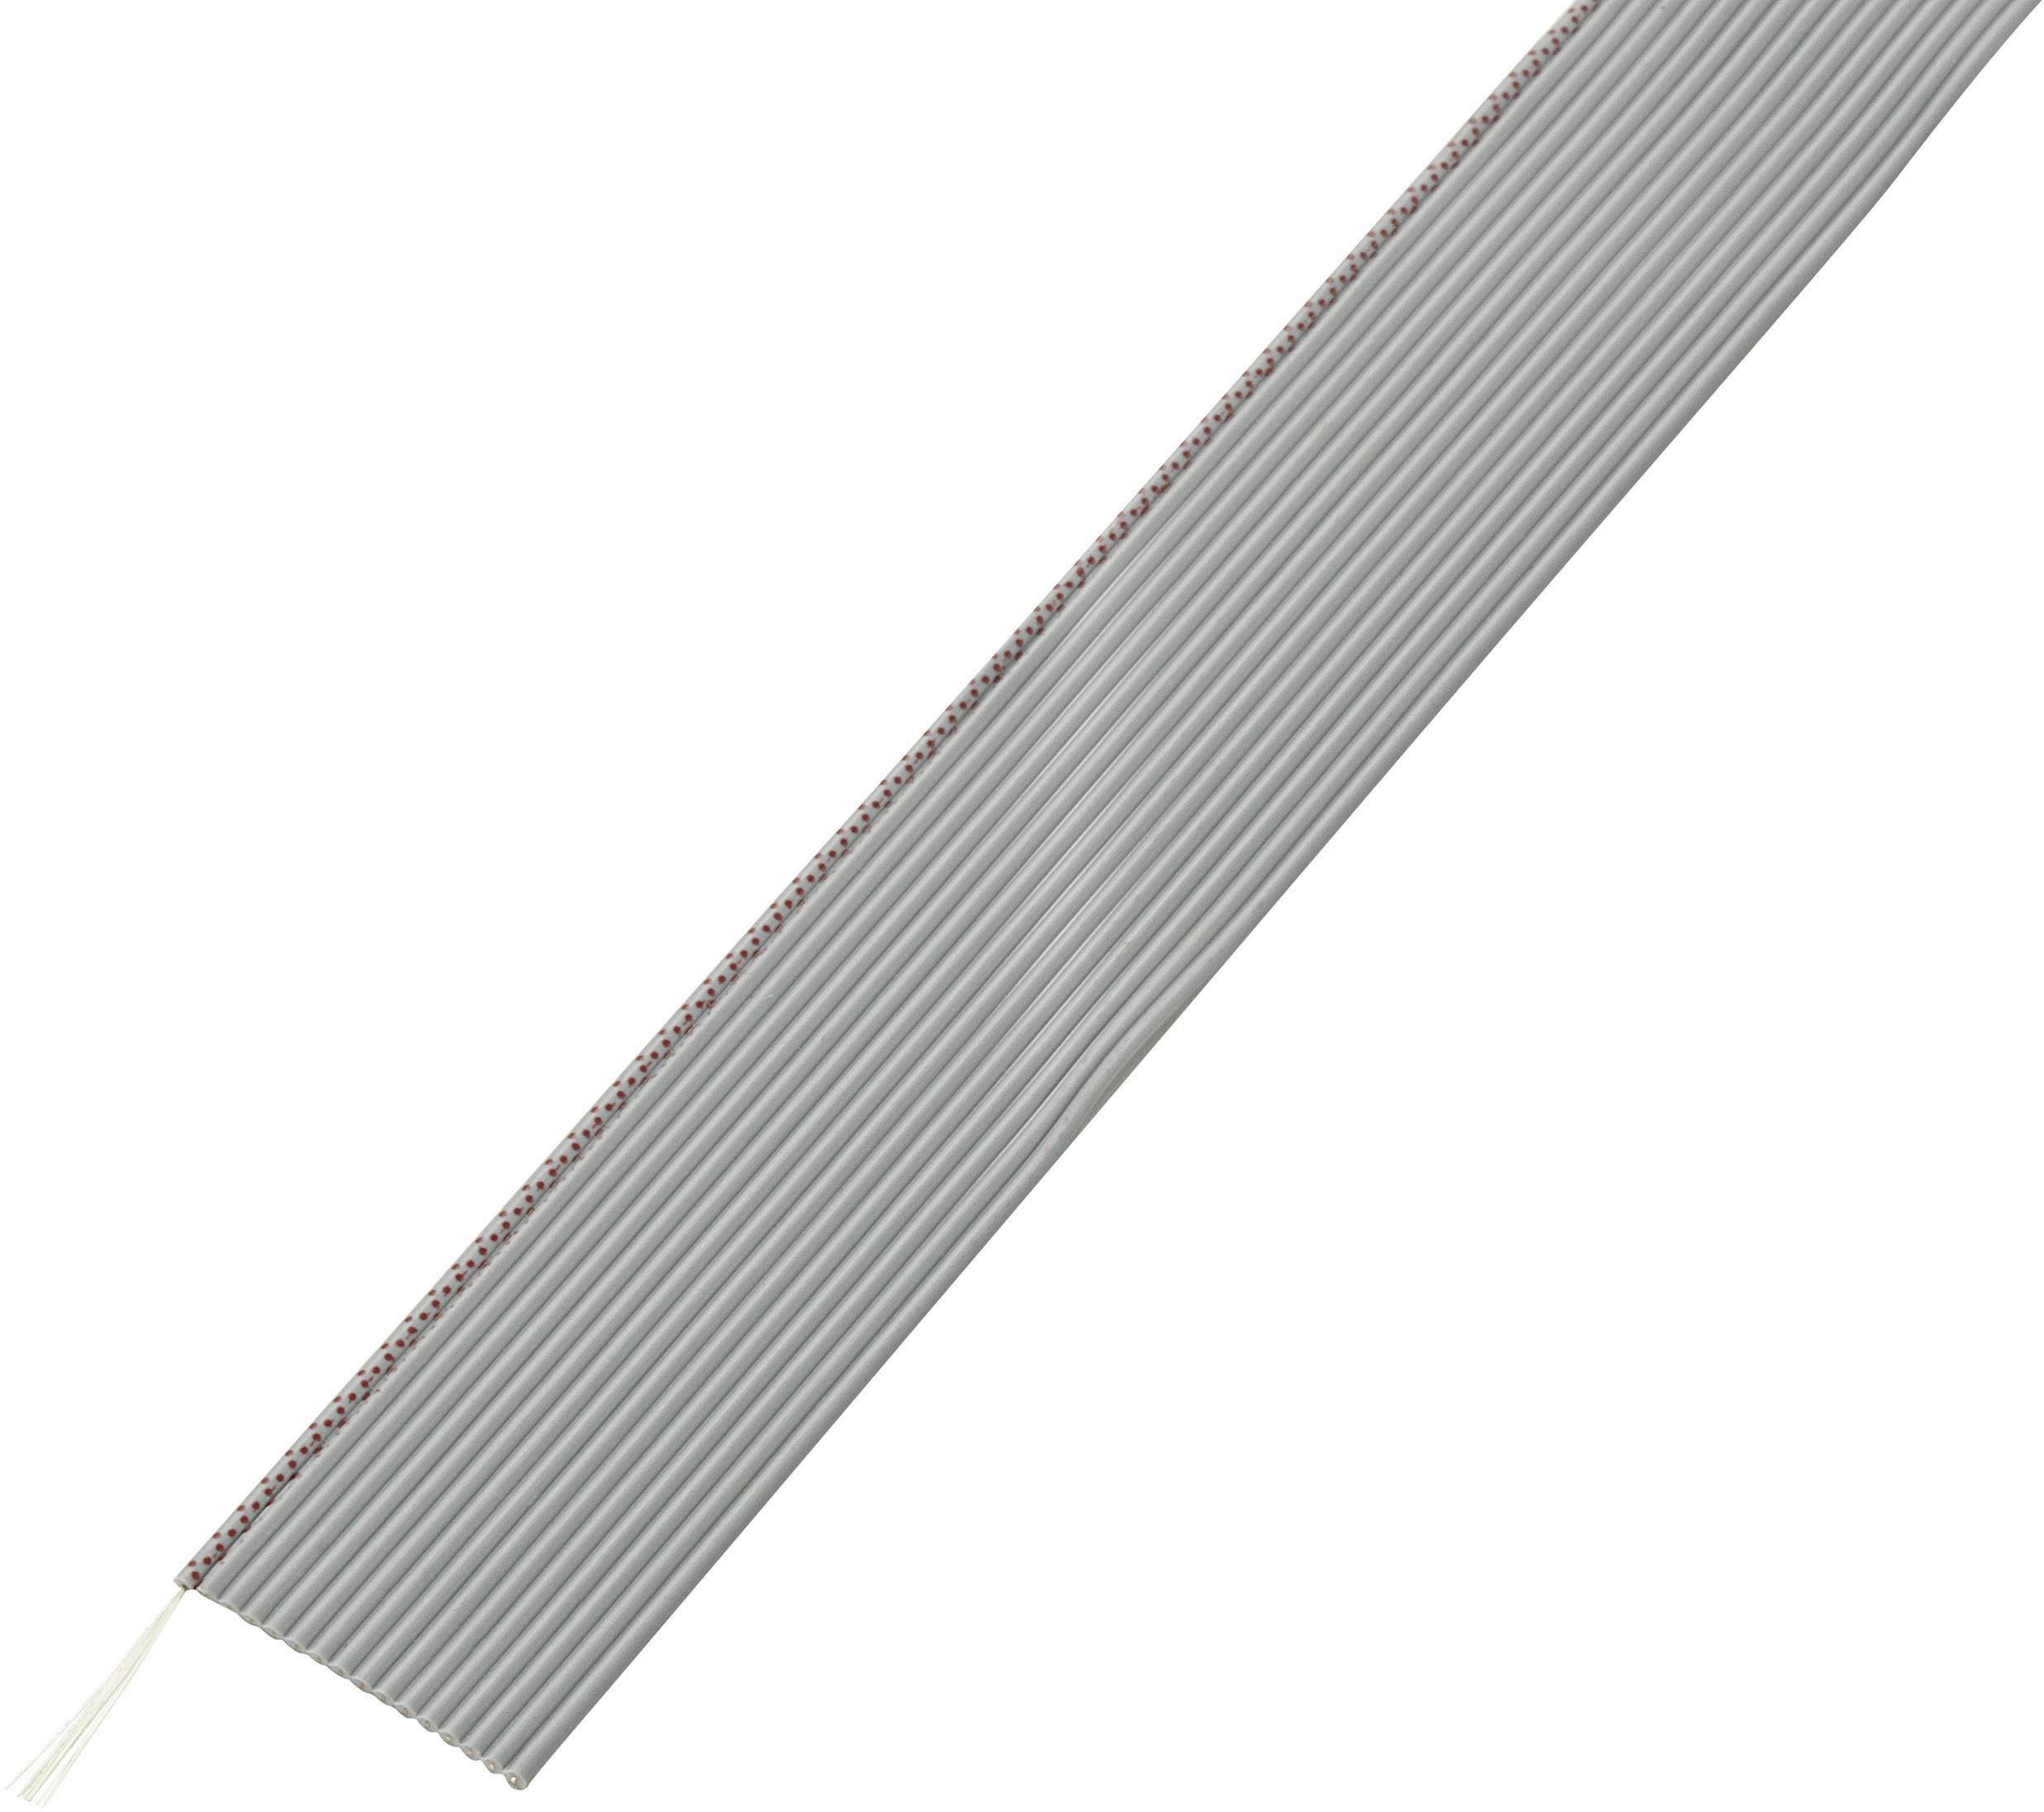 Plochý kabel Flachband cable 14P (SH1998C199), nestíněný, 30.5 m, šedá